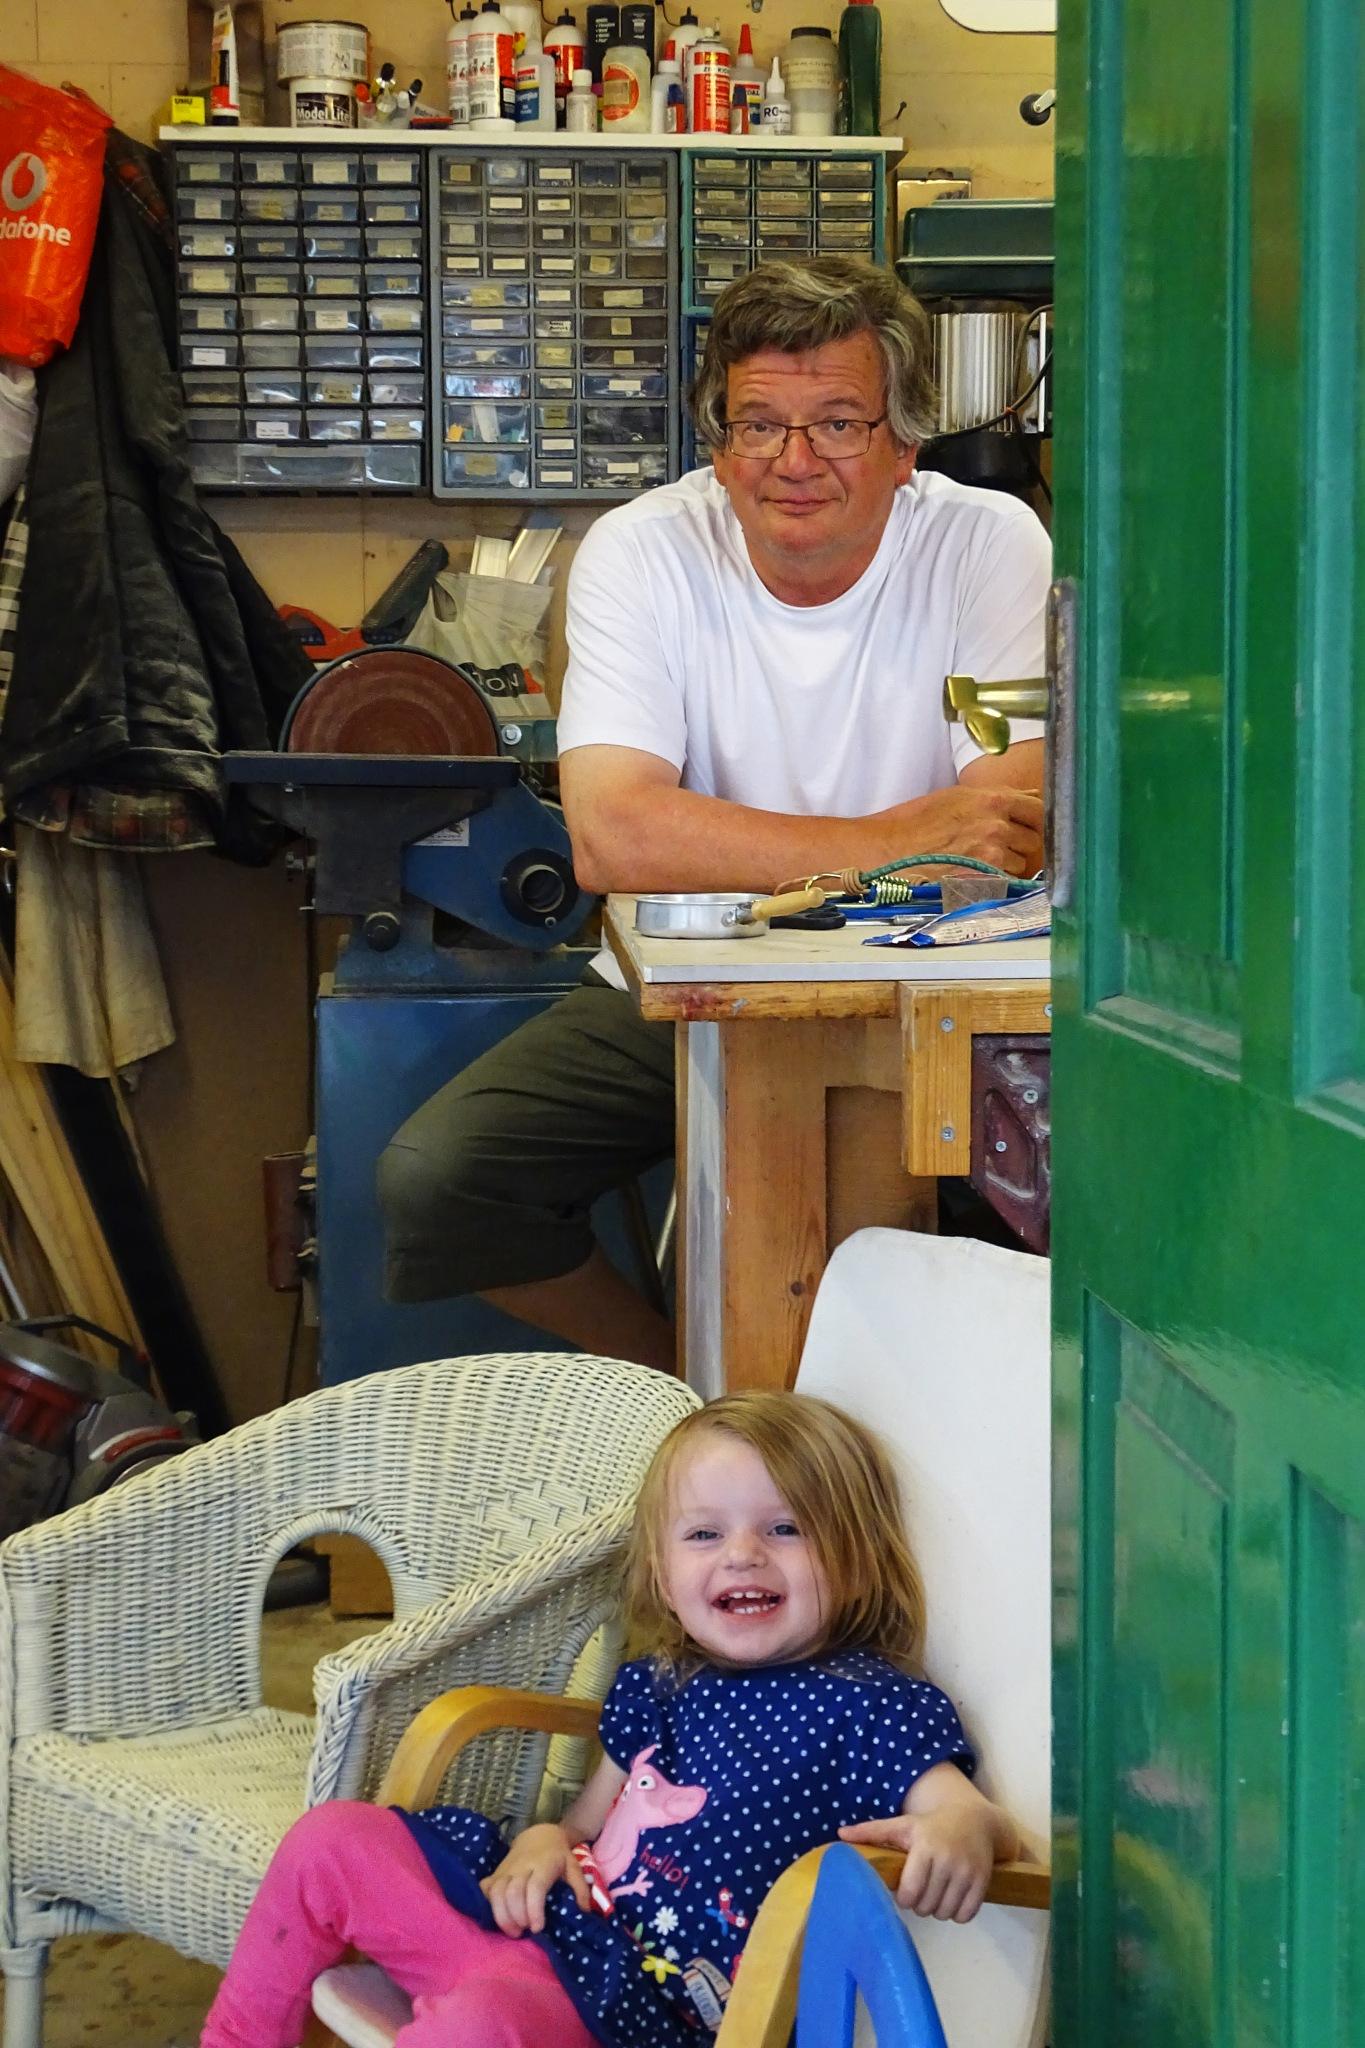 Me and Grandad own this workshop by kayThornton